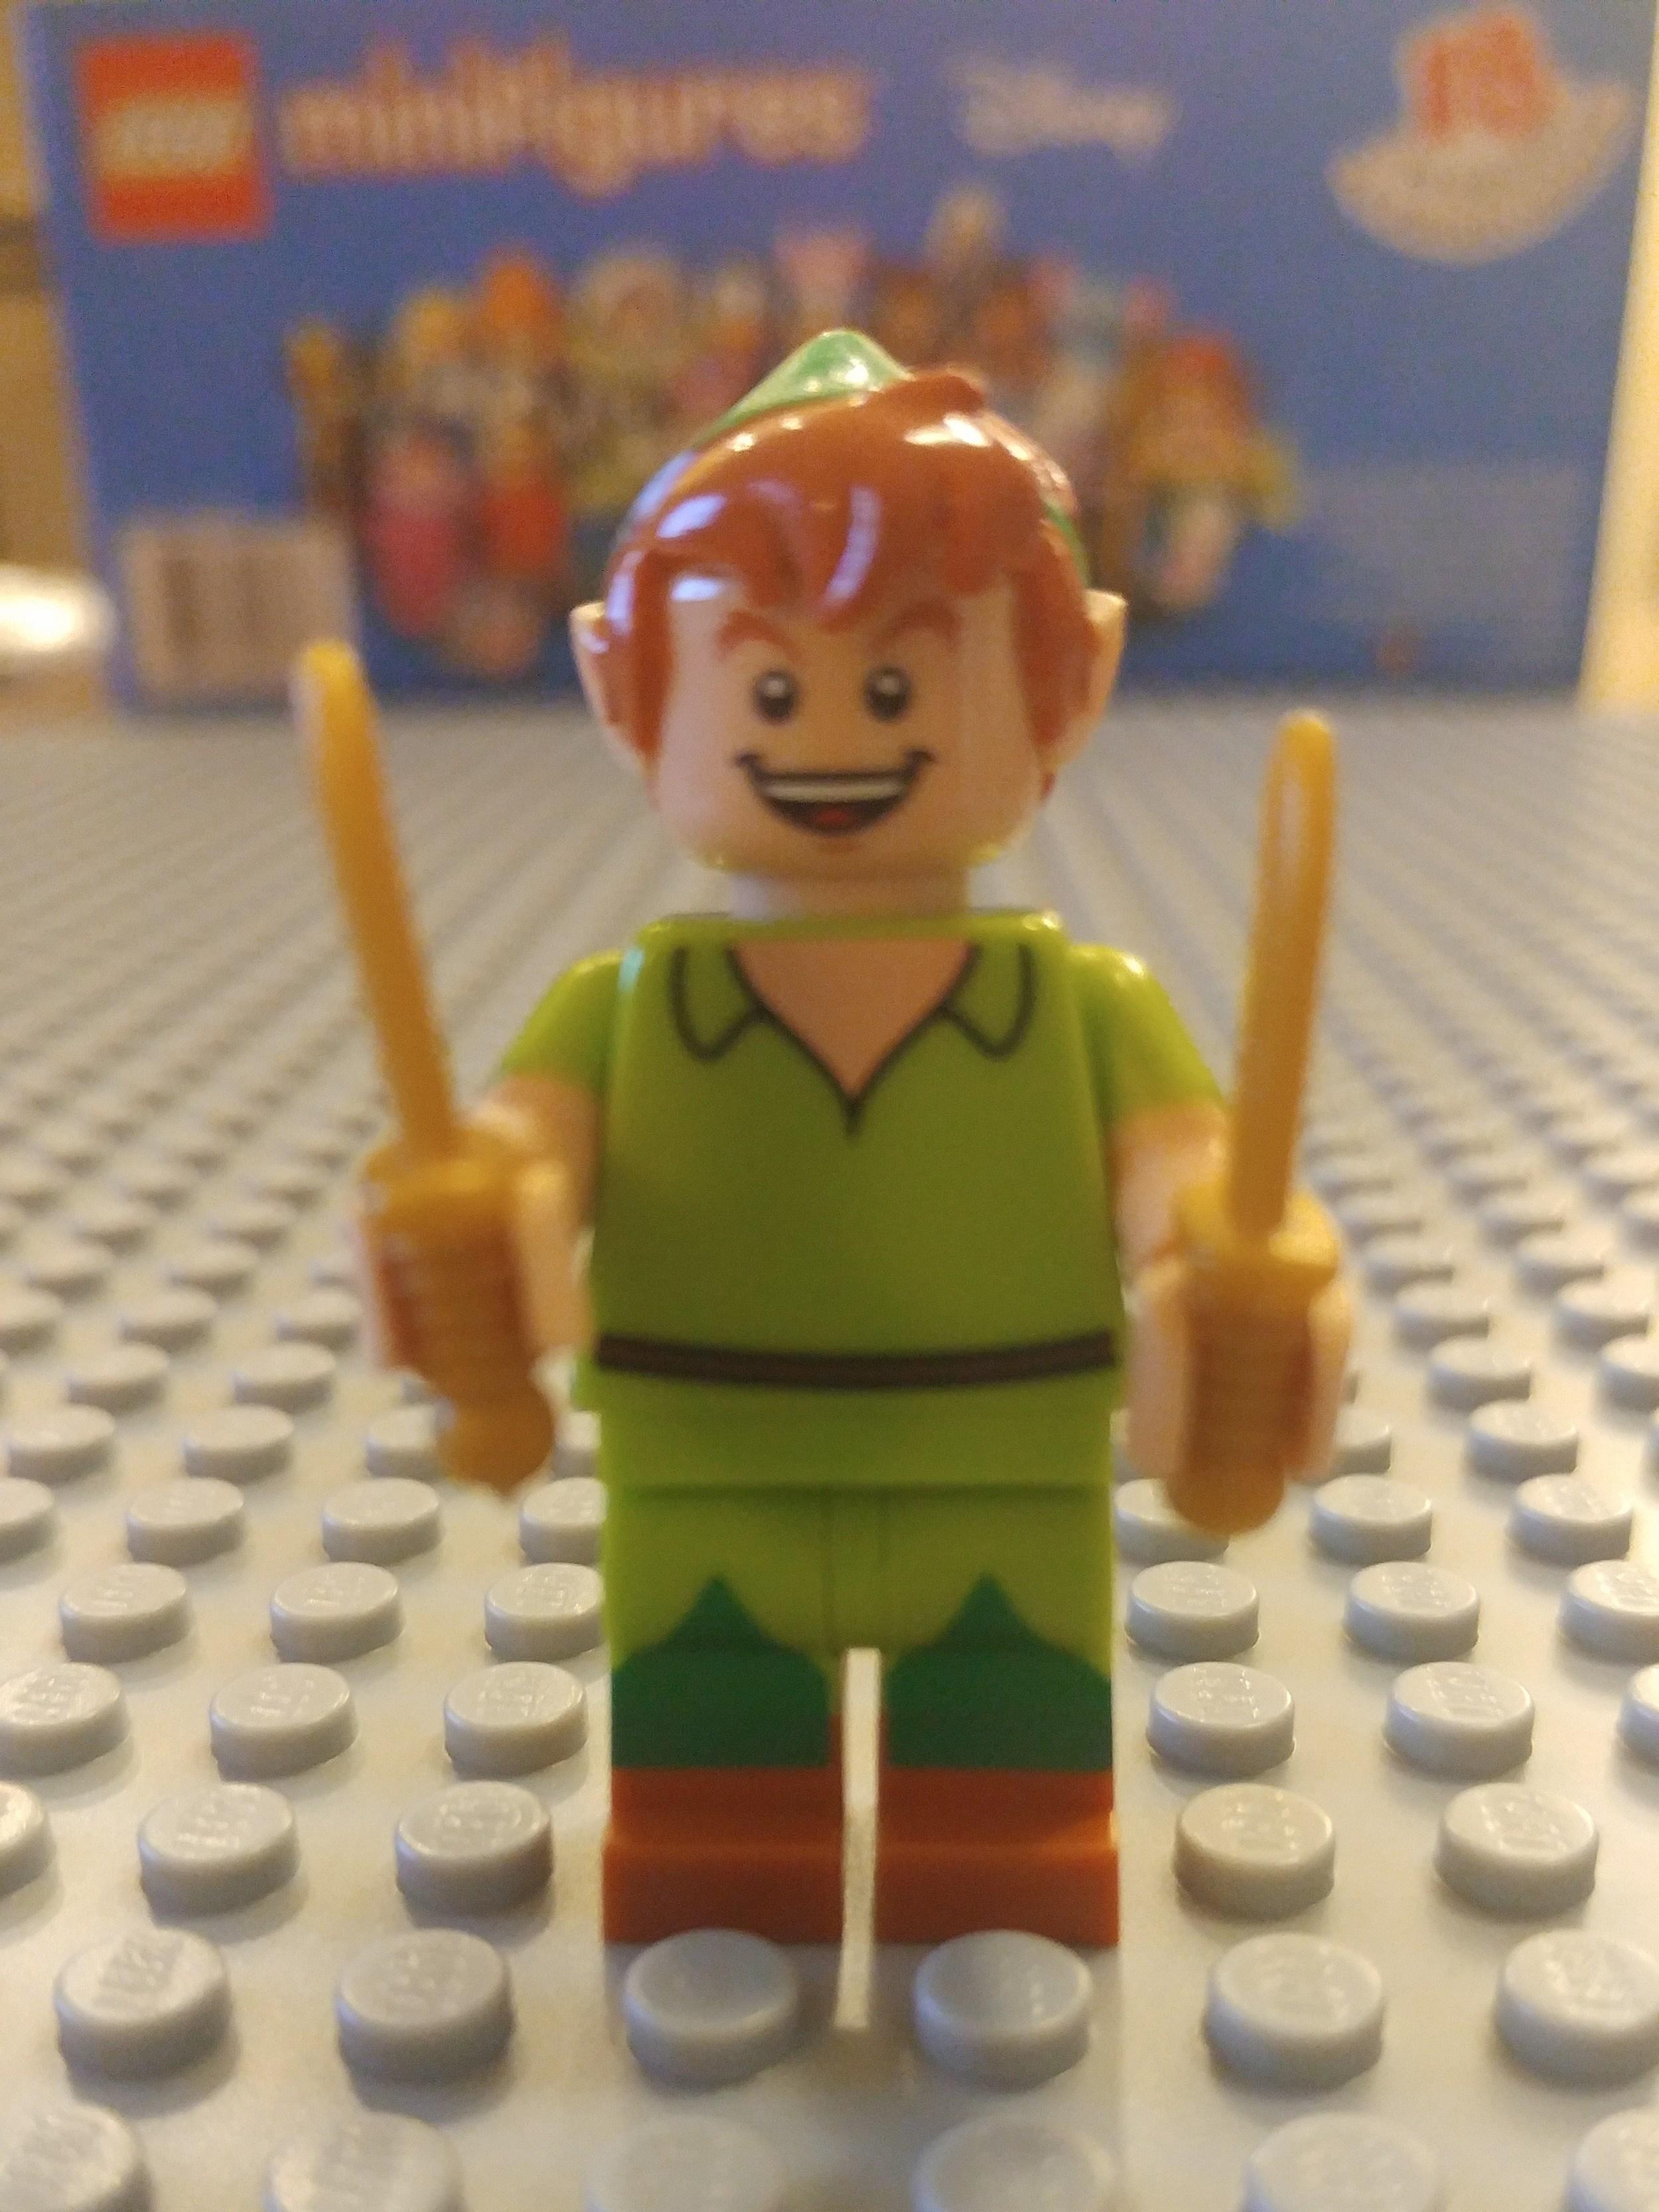 Peter Pan Minifig Close Up - Front